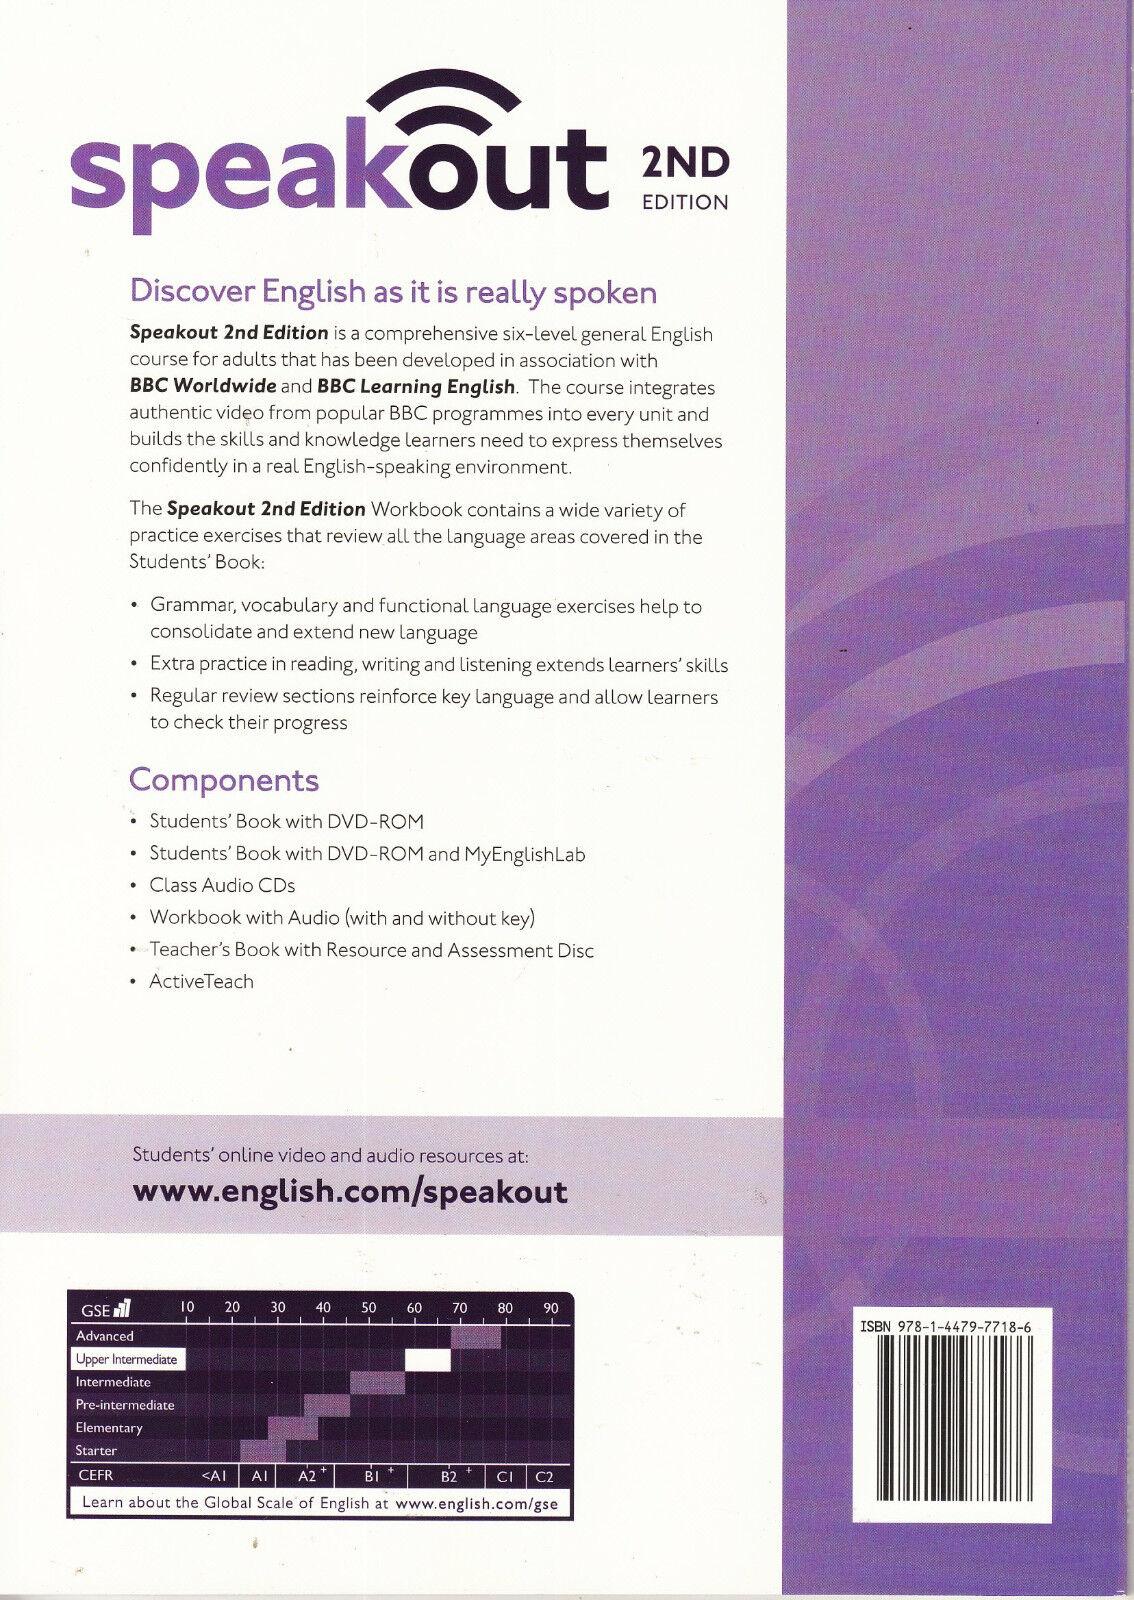 Speakout upper intermediate 2nd edition workbook with key by louis resntentobalflowflowcomponentncel fandeluxe Choice Image